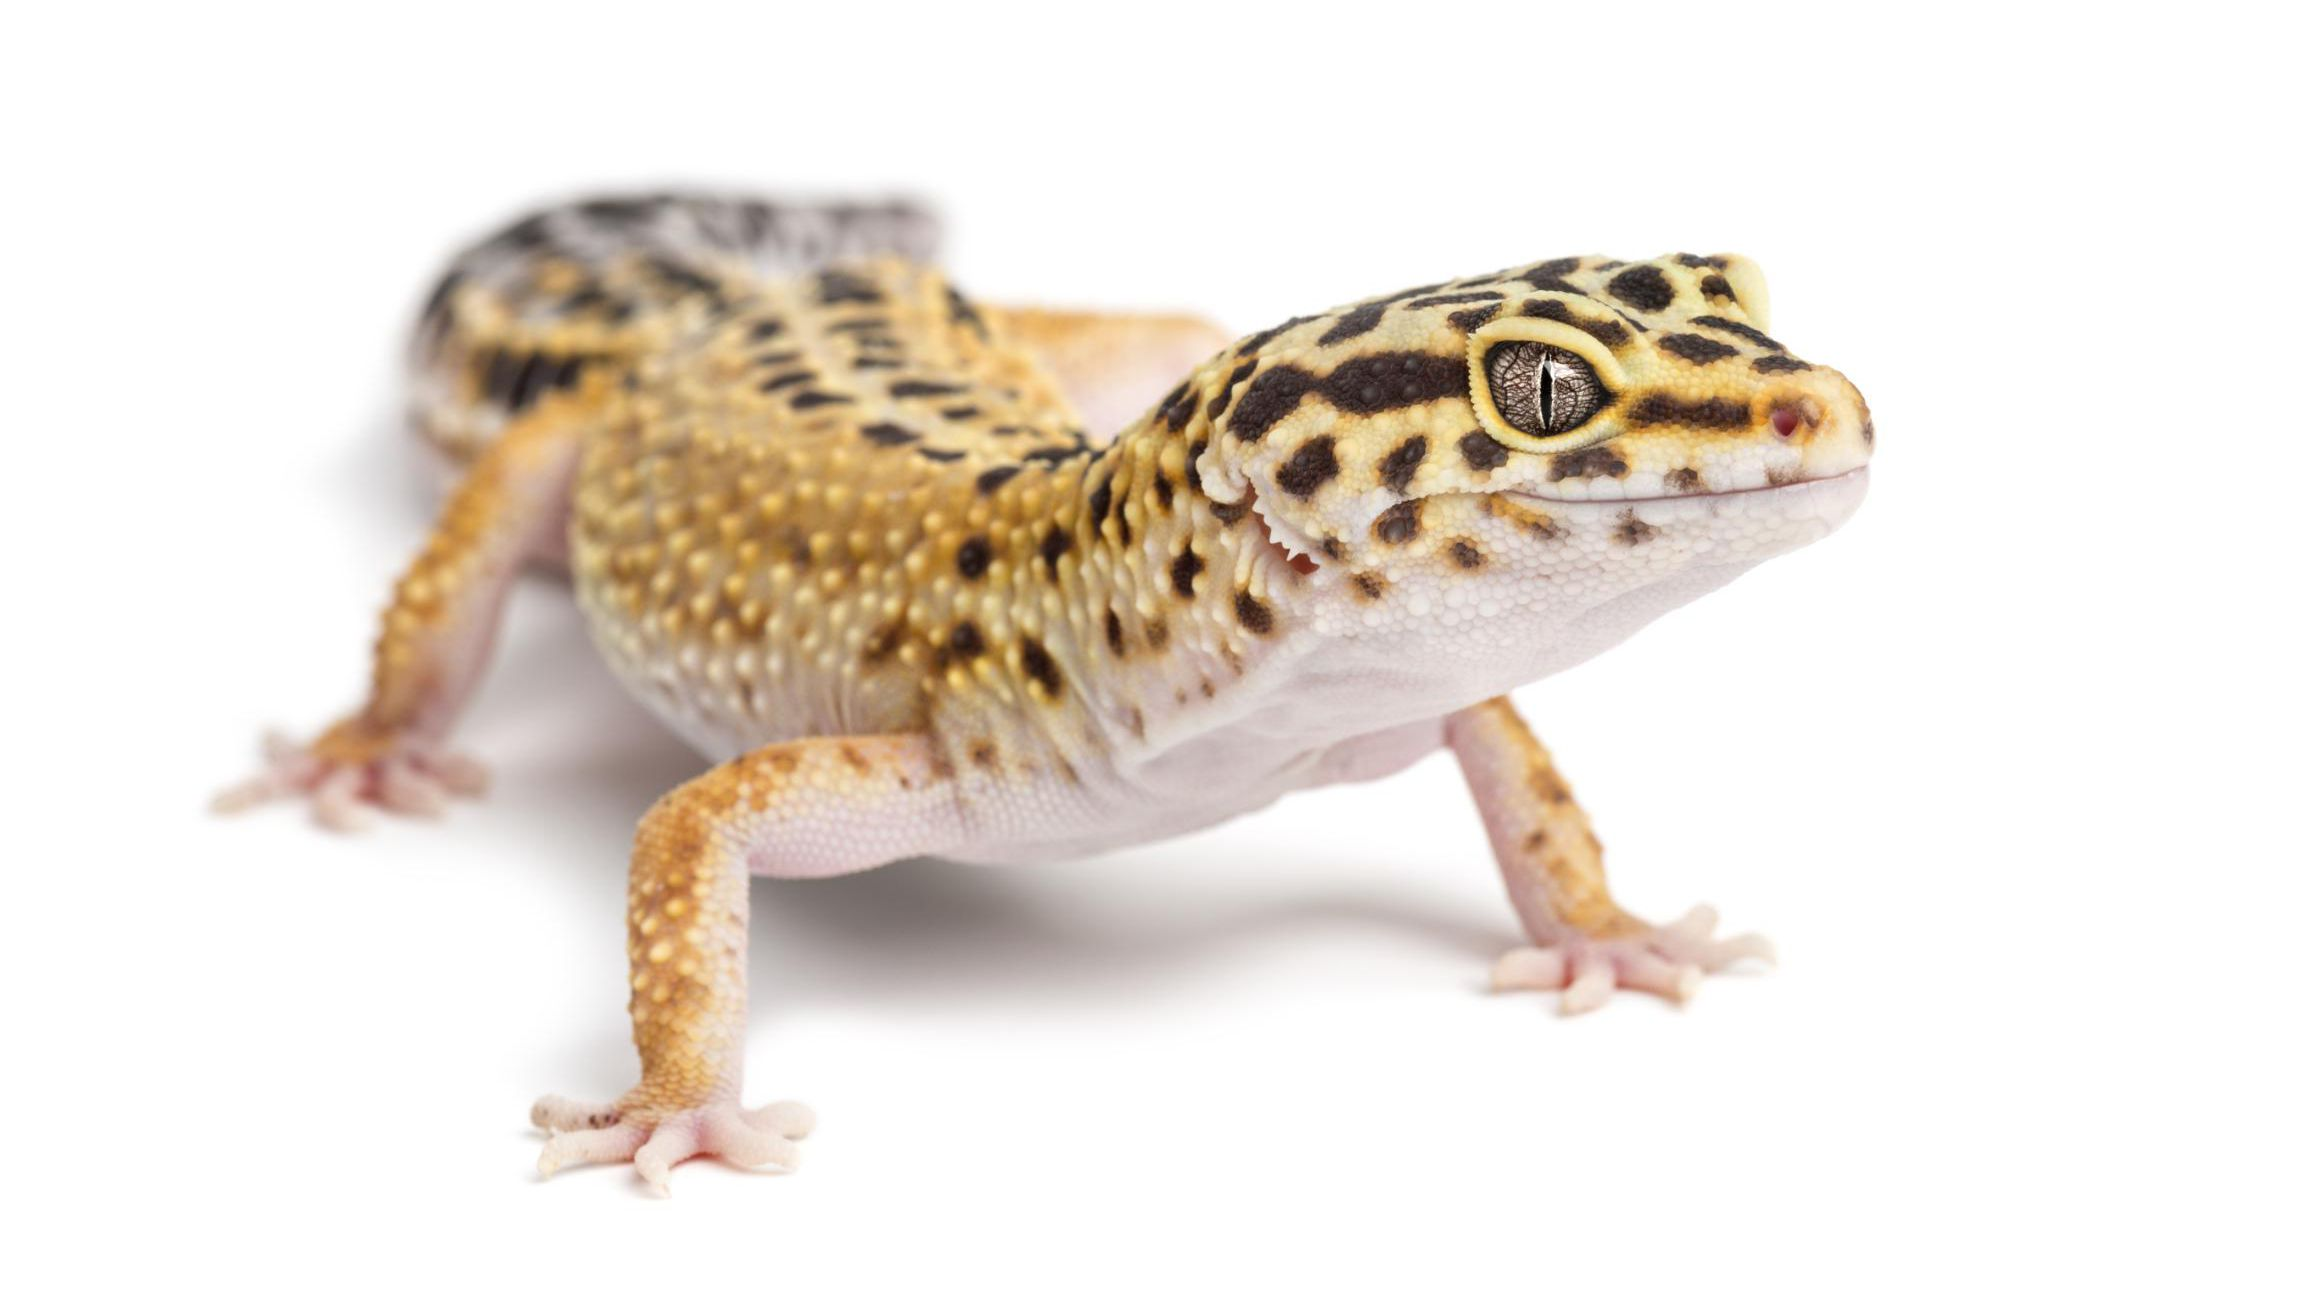 Astounding A Guide To Caring For Leopard Geckos Machost Co Dining Chair Design Ideas Machostcouk